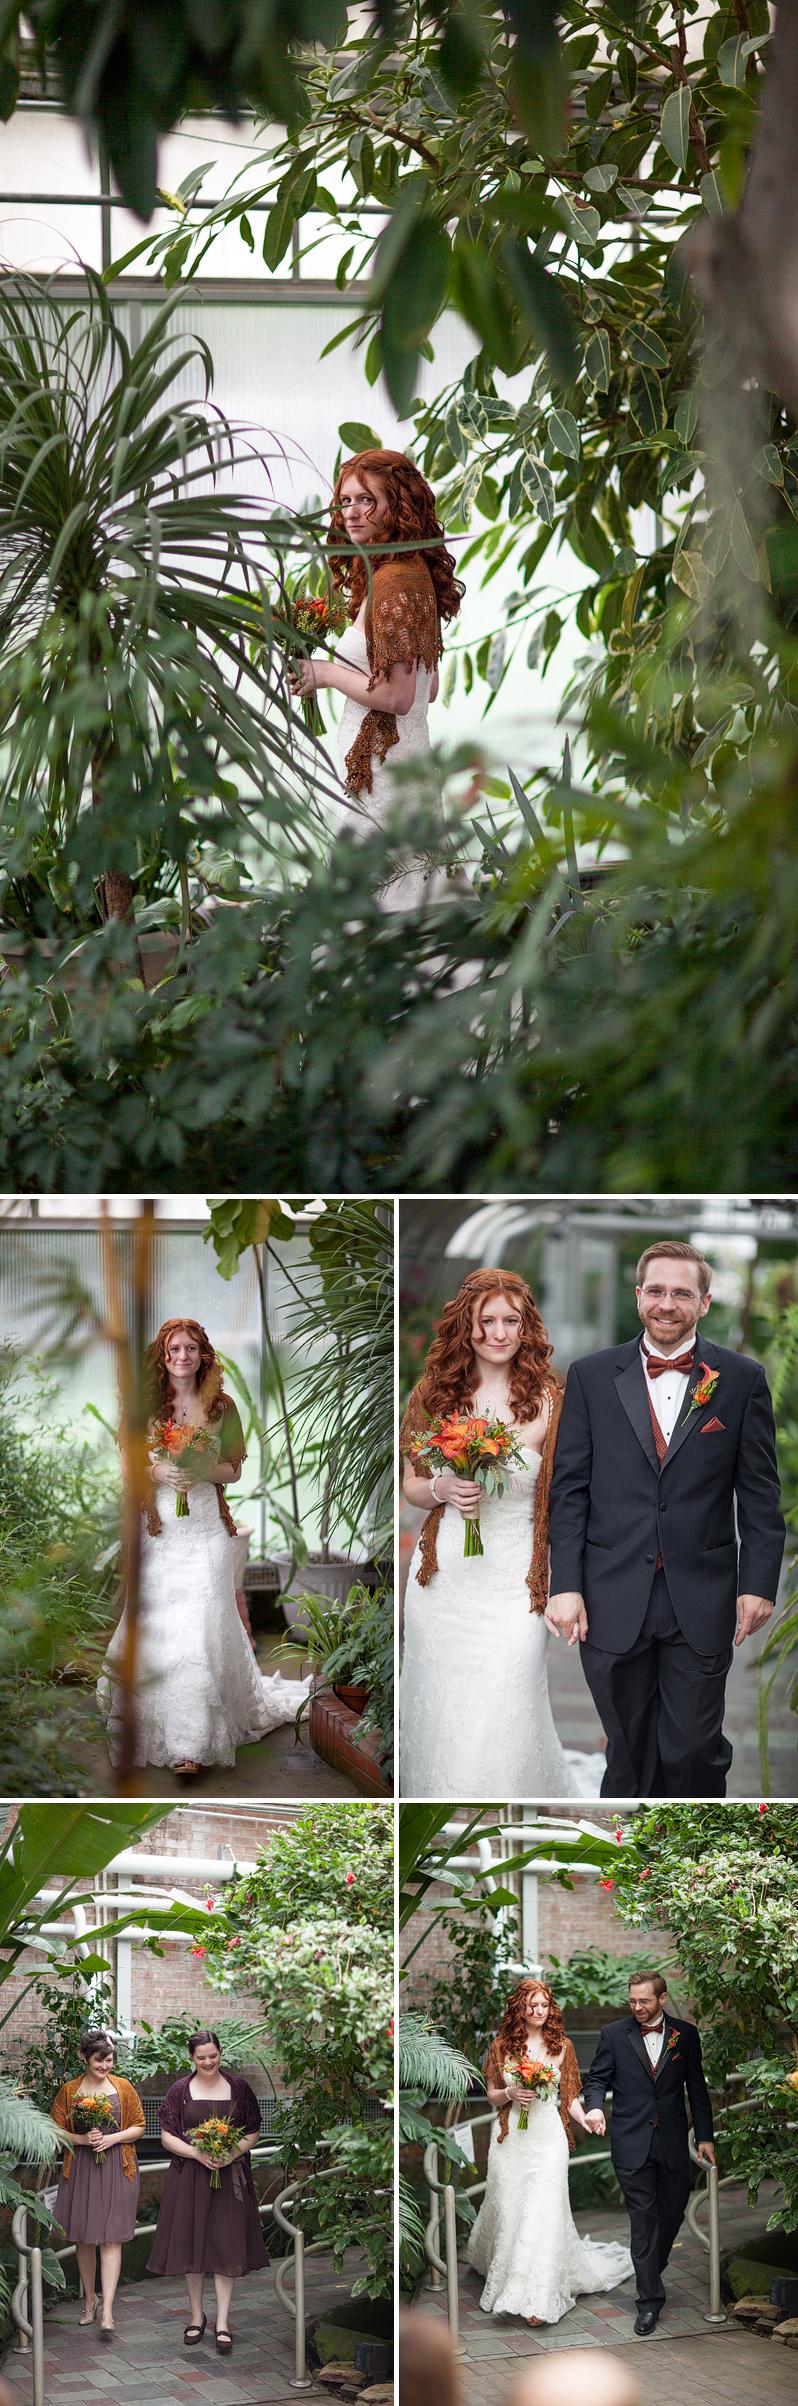 Big Day: Caitlyn and Jeffrey - Weddings - OMG Photography